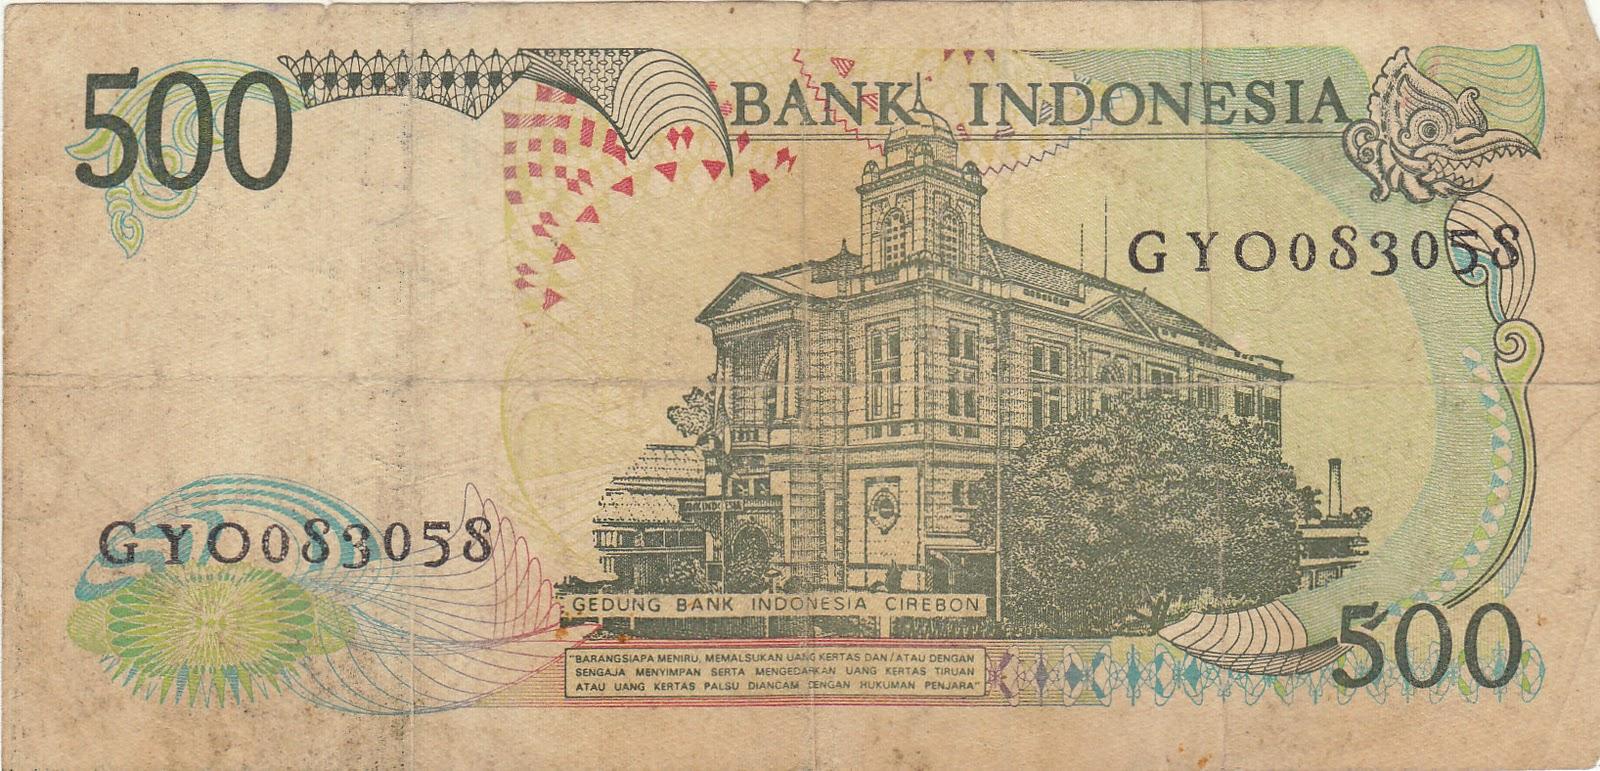 Uang rp. 500